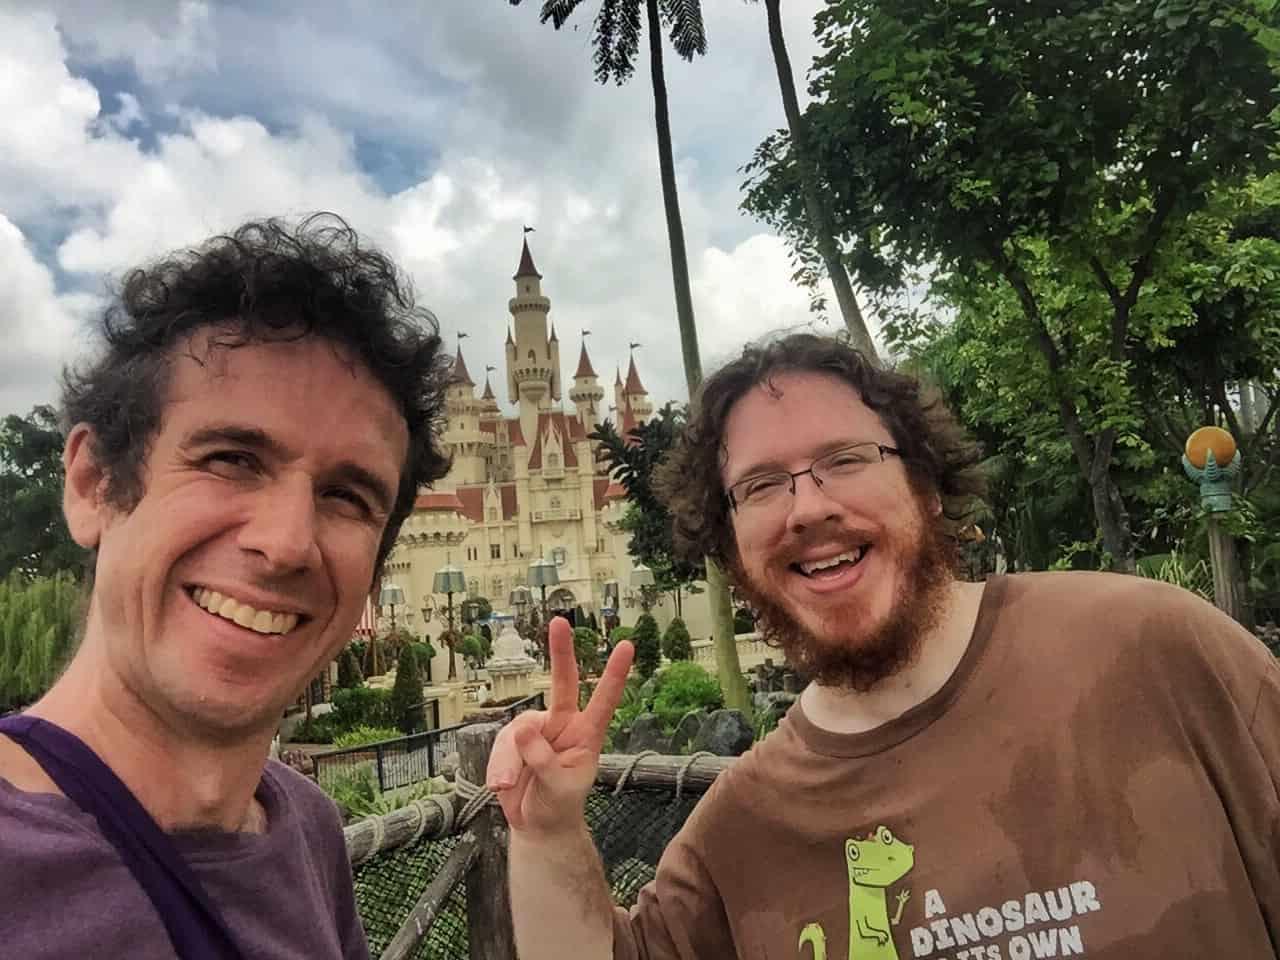 A photo of Simon and Kevin Fairbairn Universal Studios Singapore